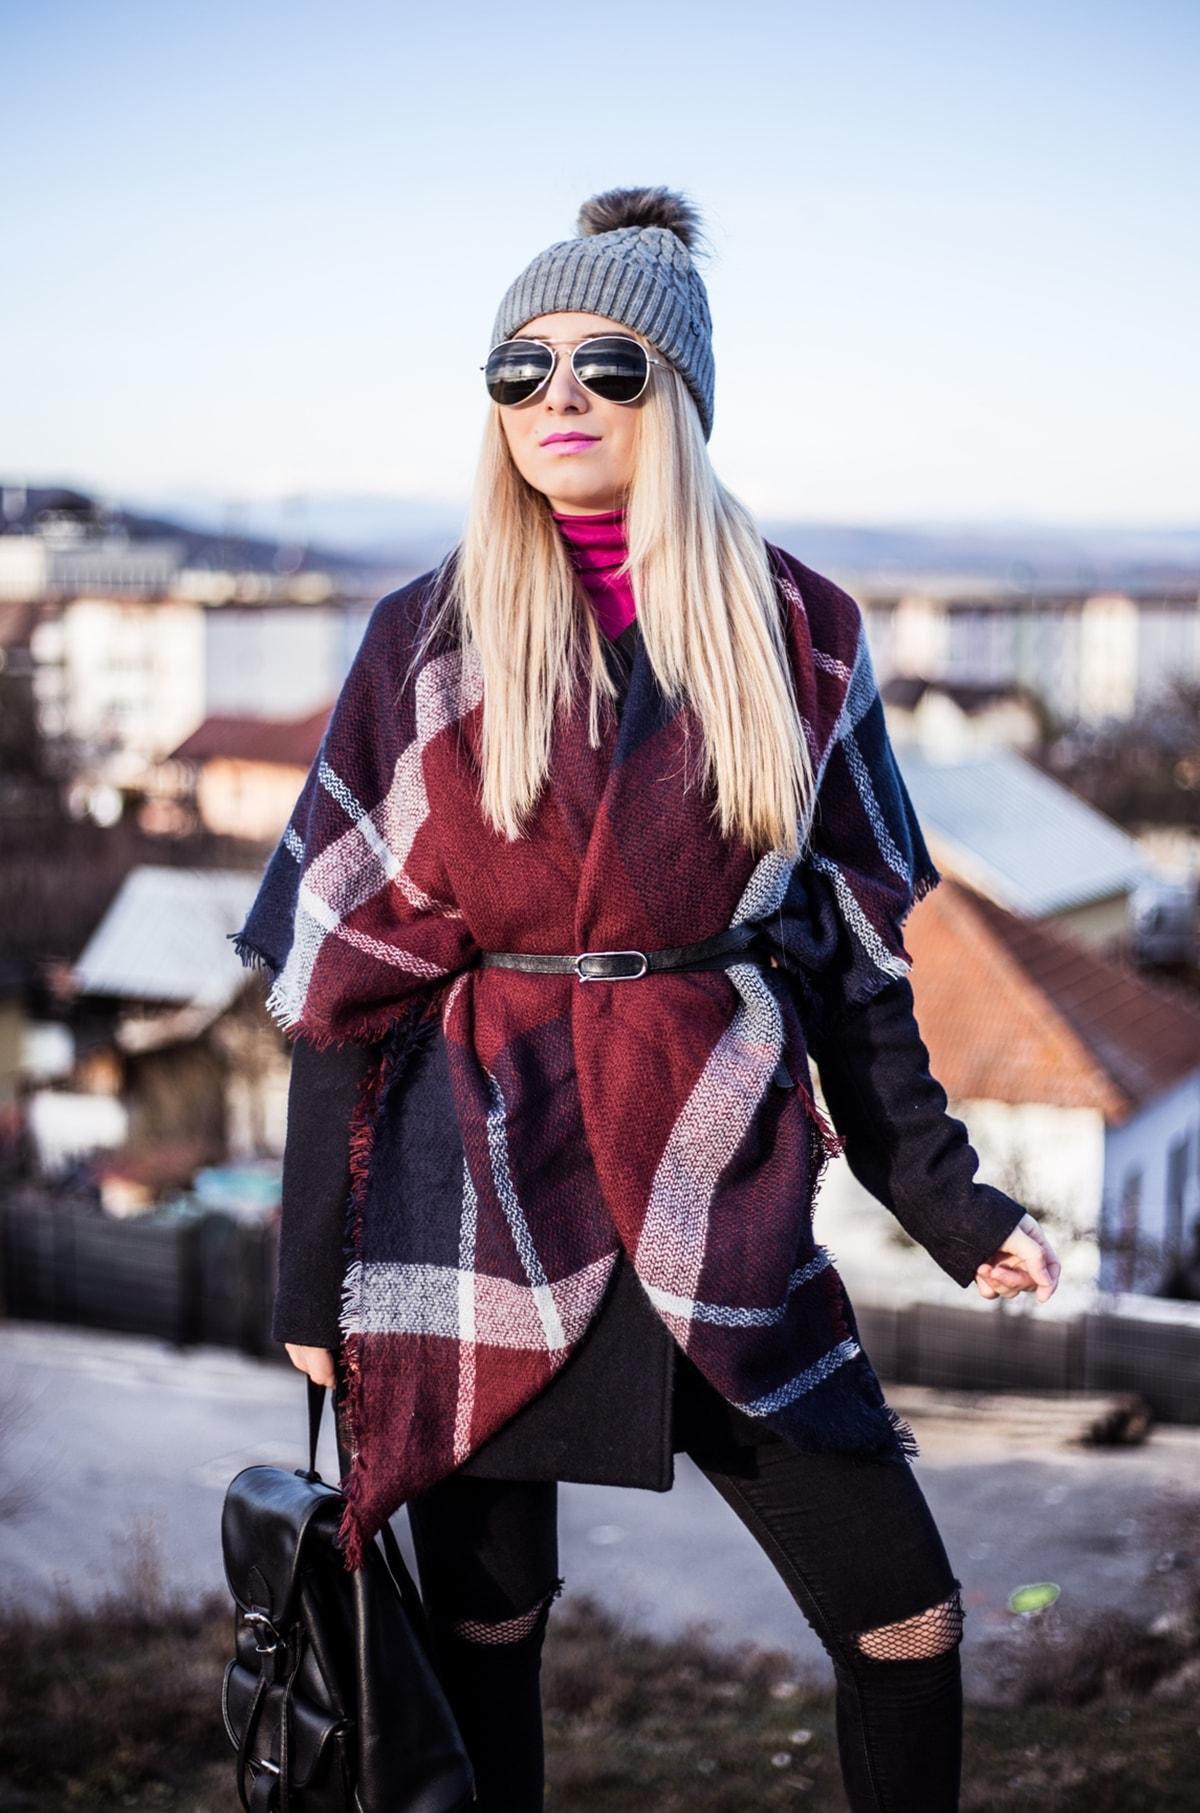 Andreea Ristea - esarfa carouri, iarna, tinuta iarna, vis de iarna, frig